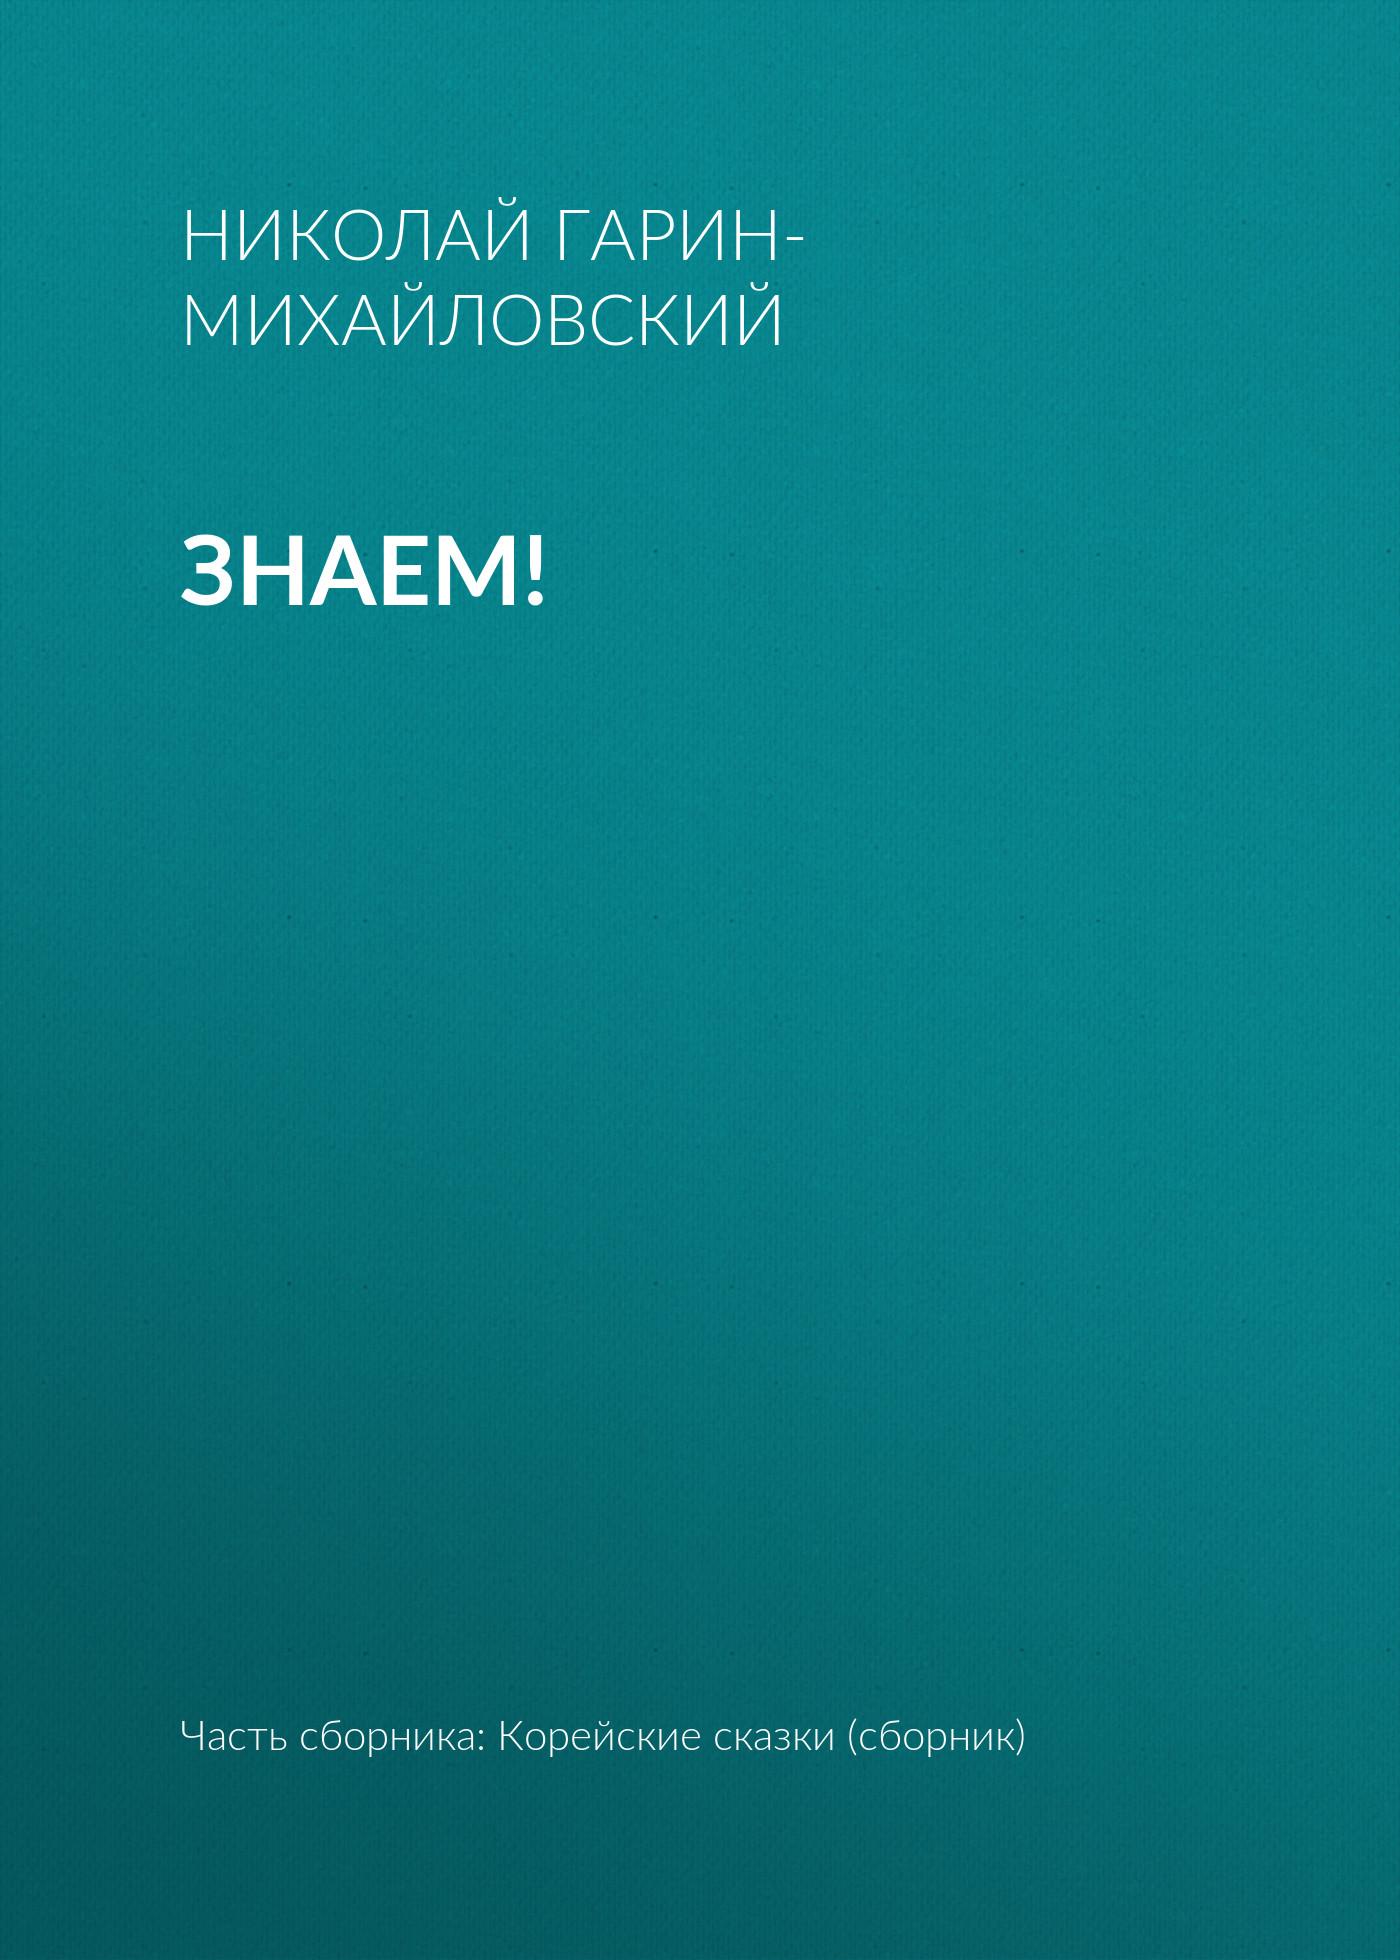 Николай Гарин-Михайловский Знаем! николай гарин михайловский счастье